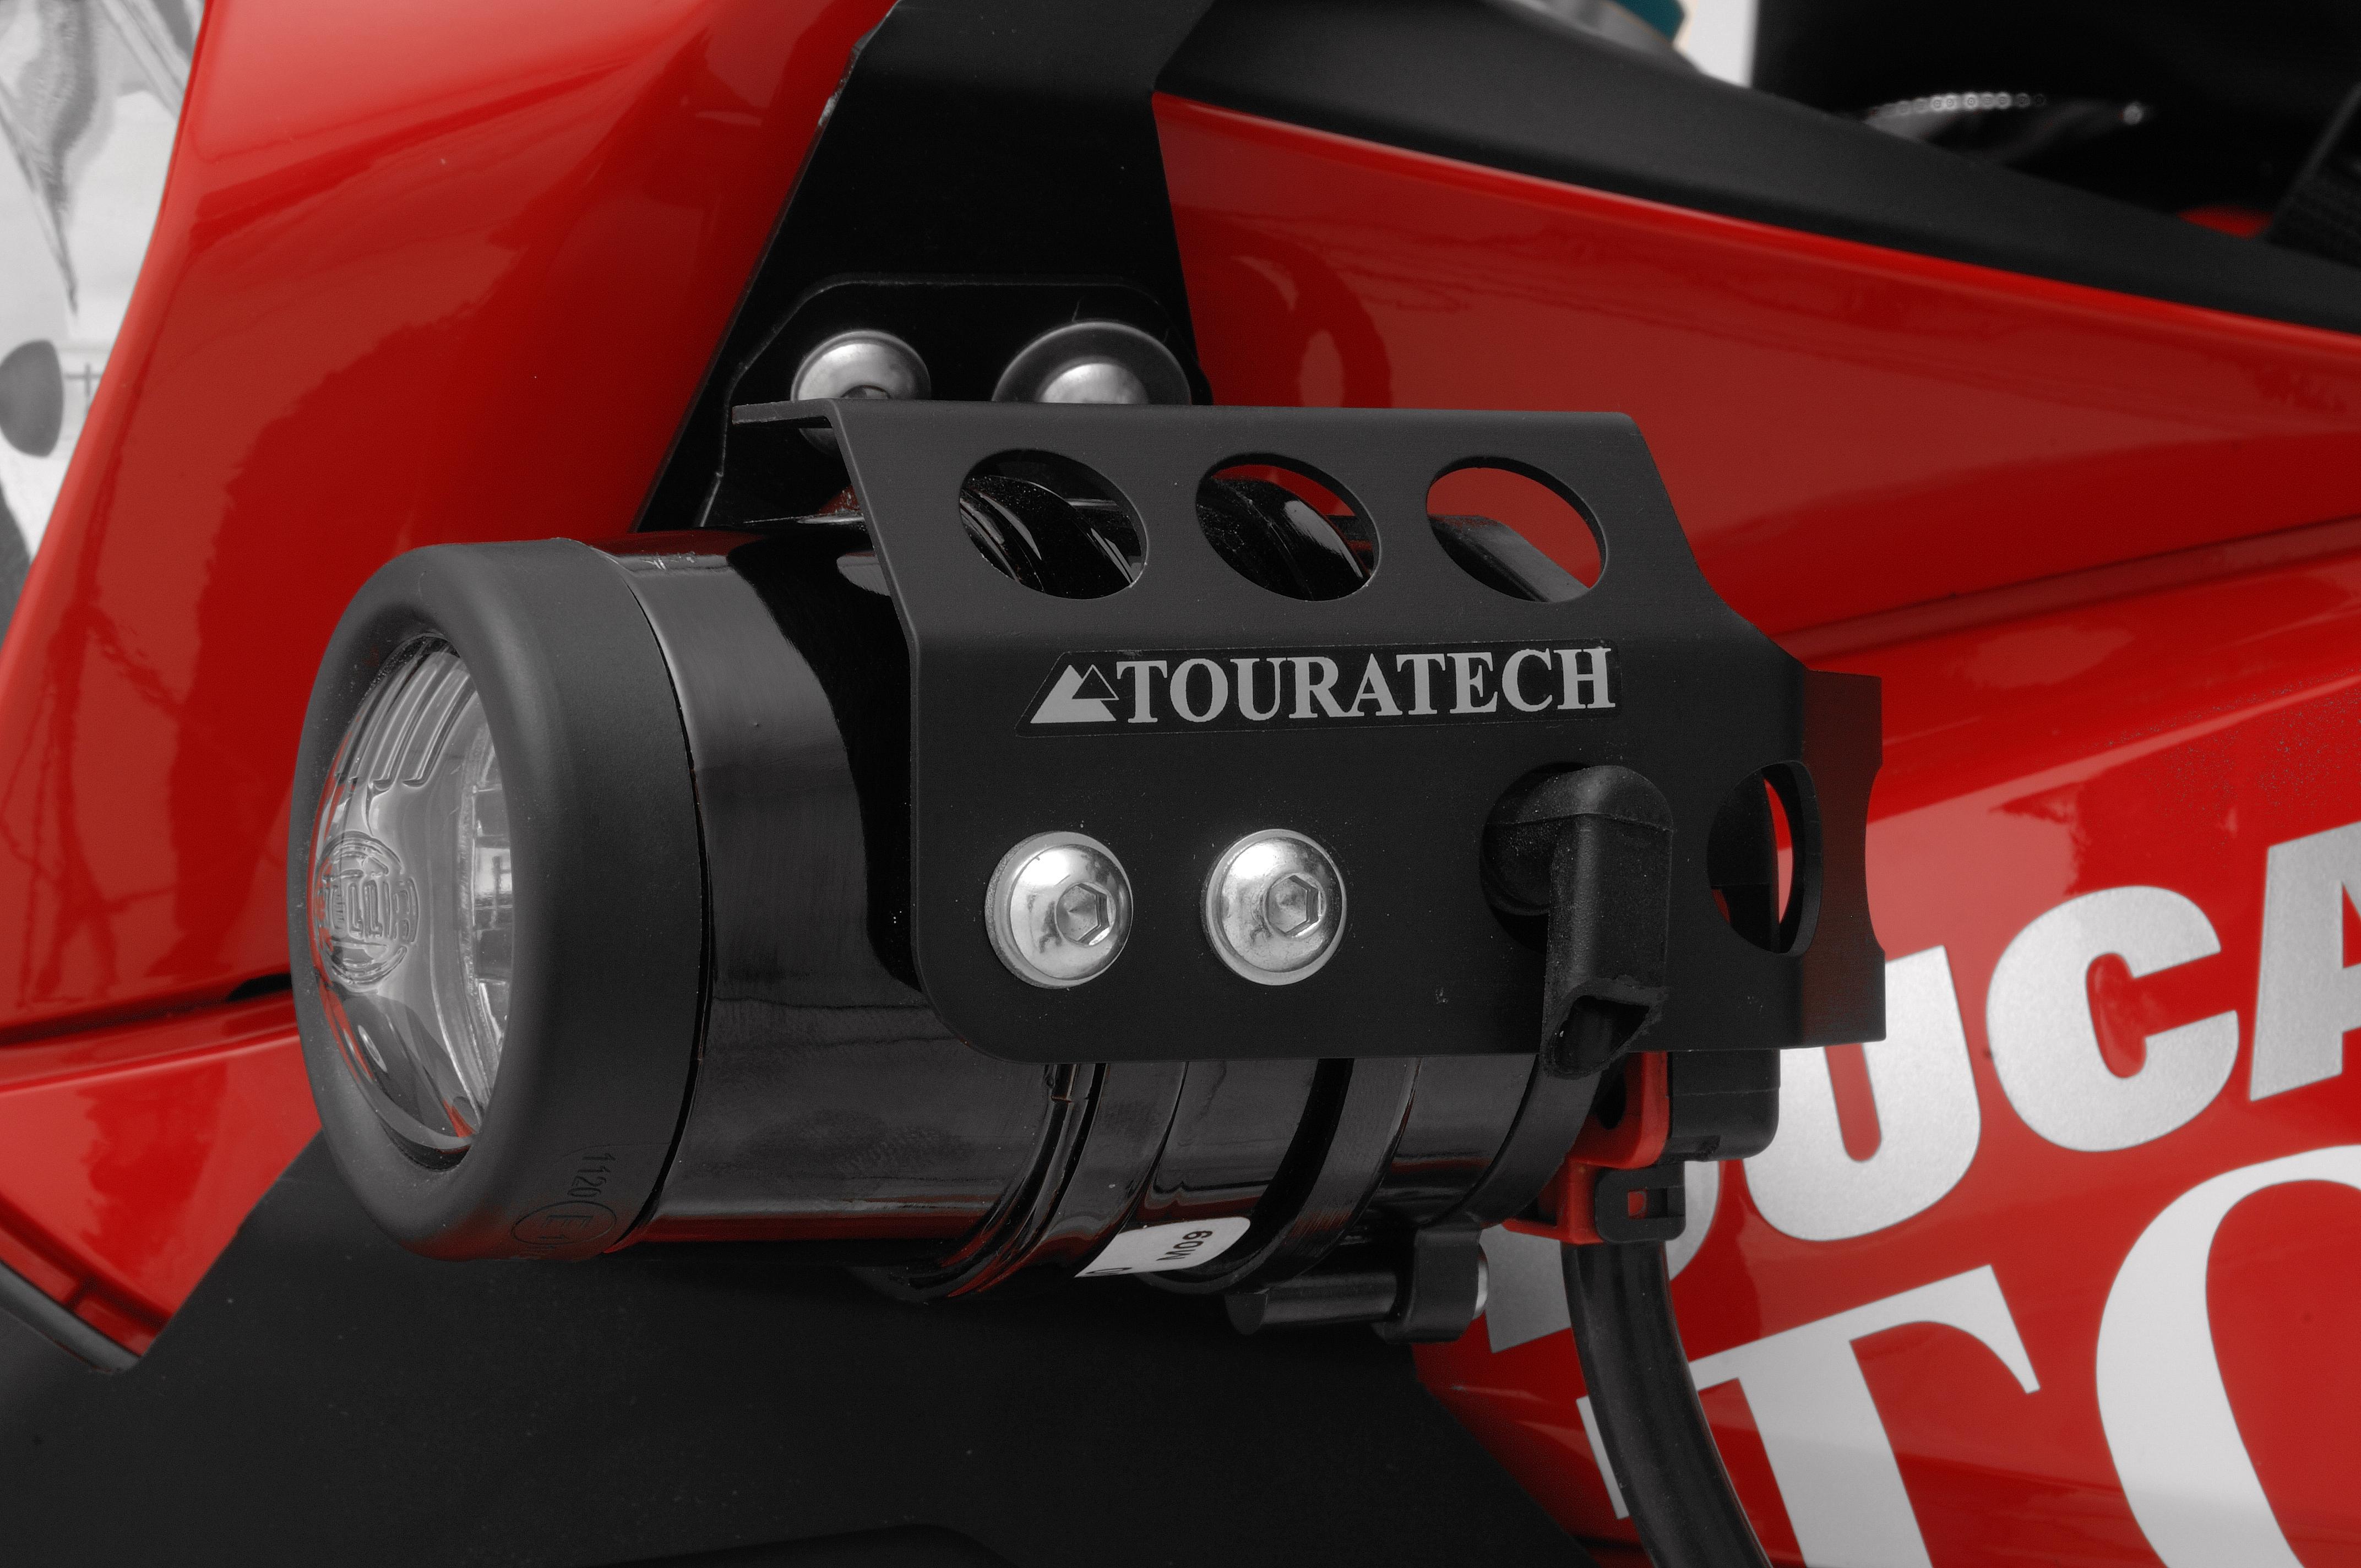 Essential Accessories For Ducati Multistrada 1200